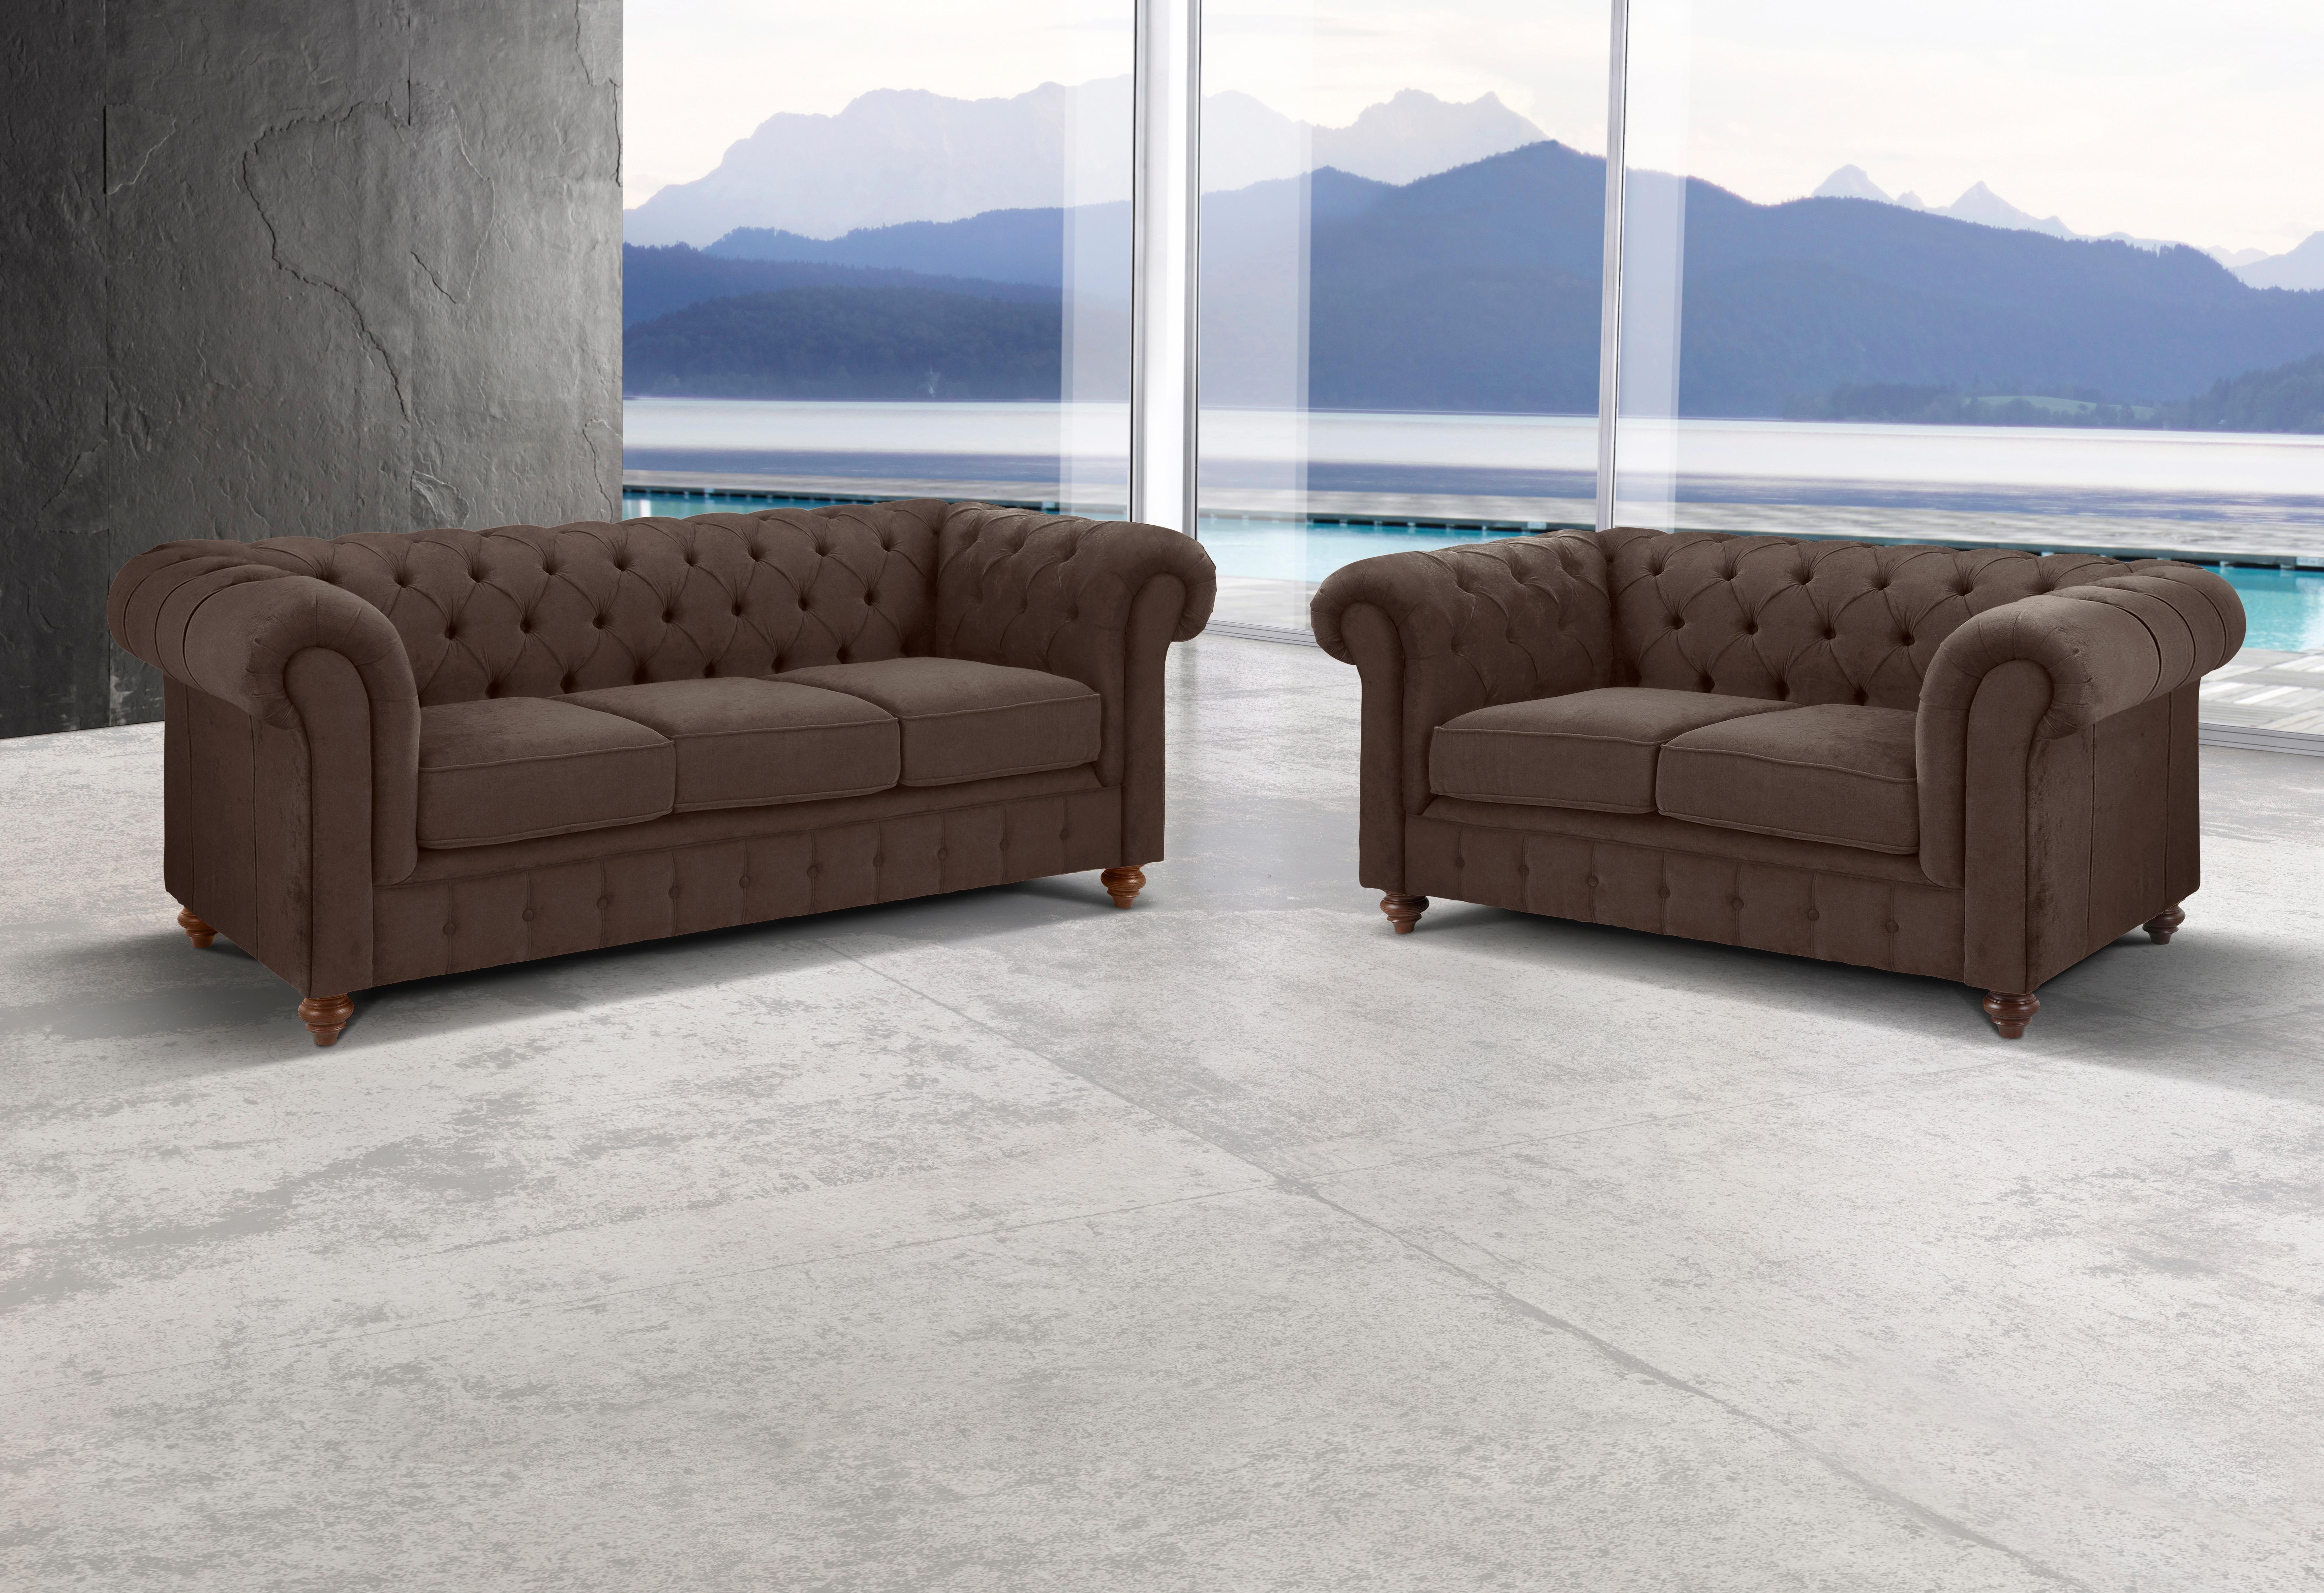 Premium Collection By Home Affaire Set »Chesterfield«, 3-zitsbank en 2-zitsbank, Premium collection - verschillende betaalmethodes